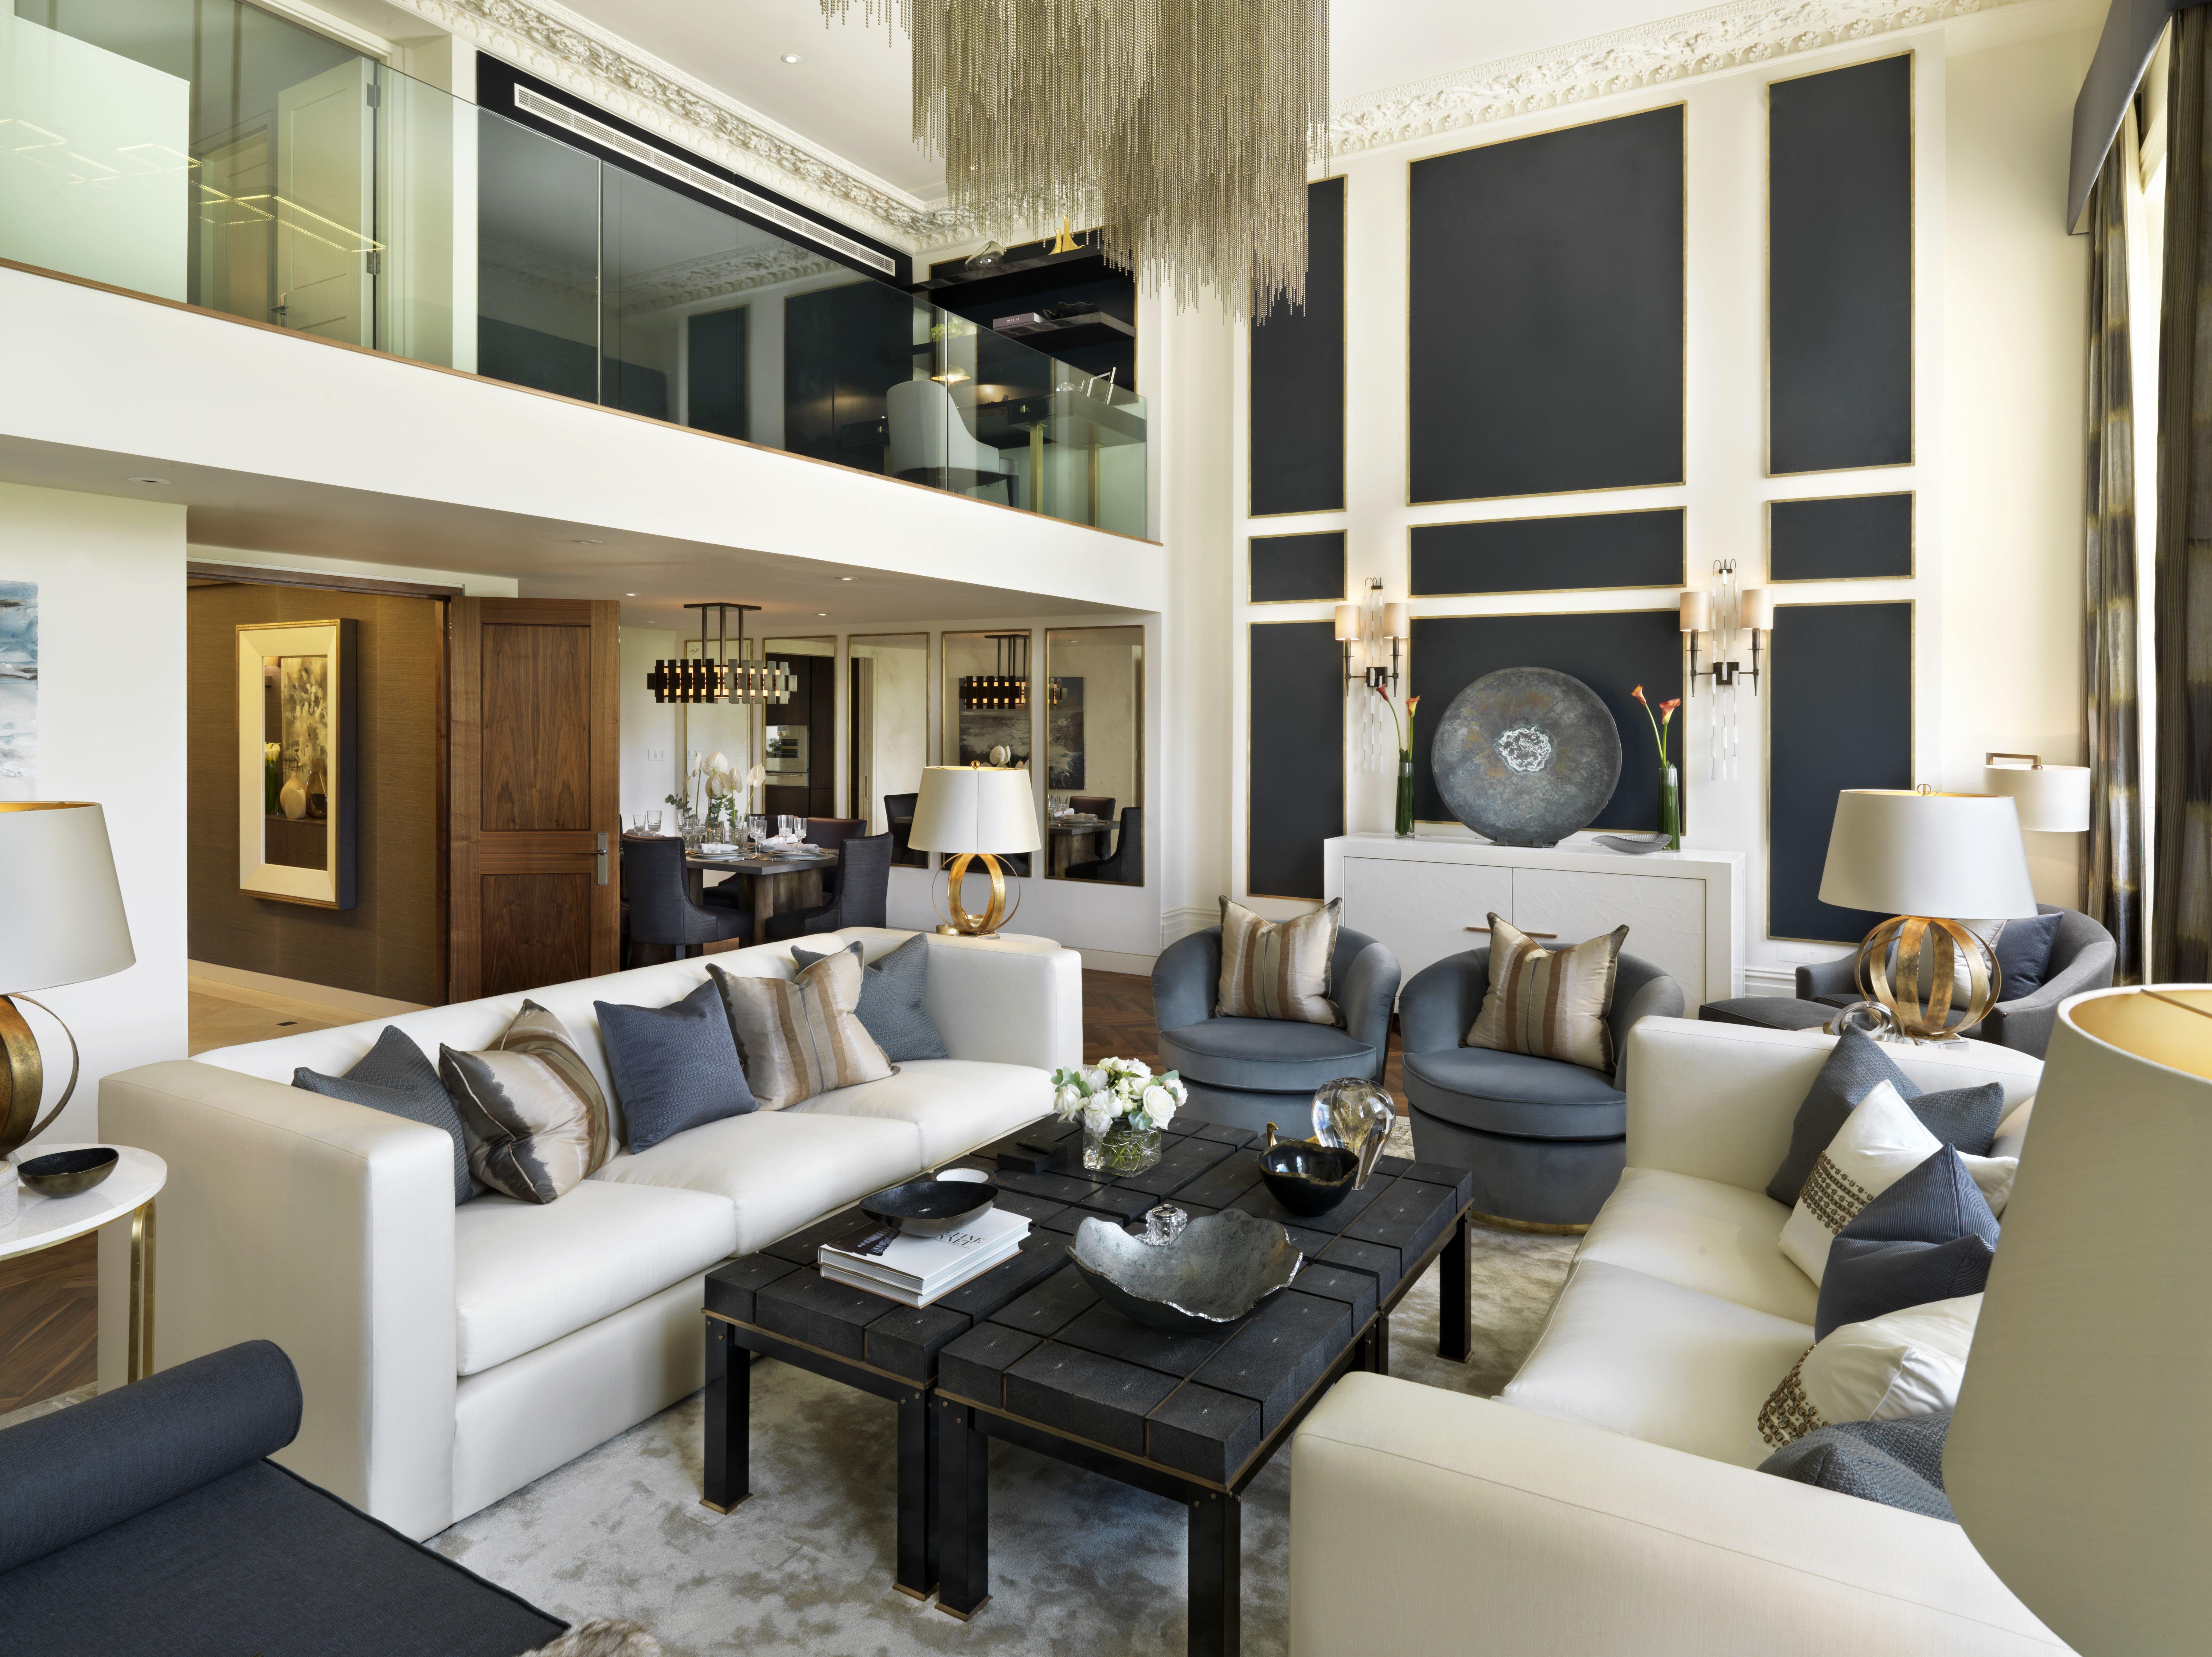 Interior Design Firms Interior Designers In London| Katharine Pooley |  Luxury